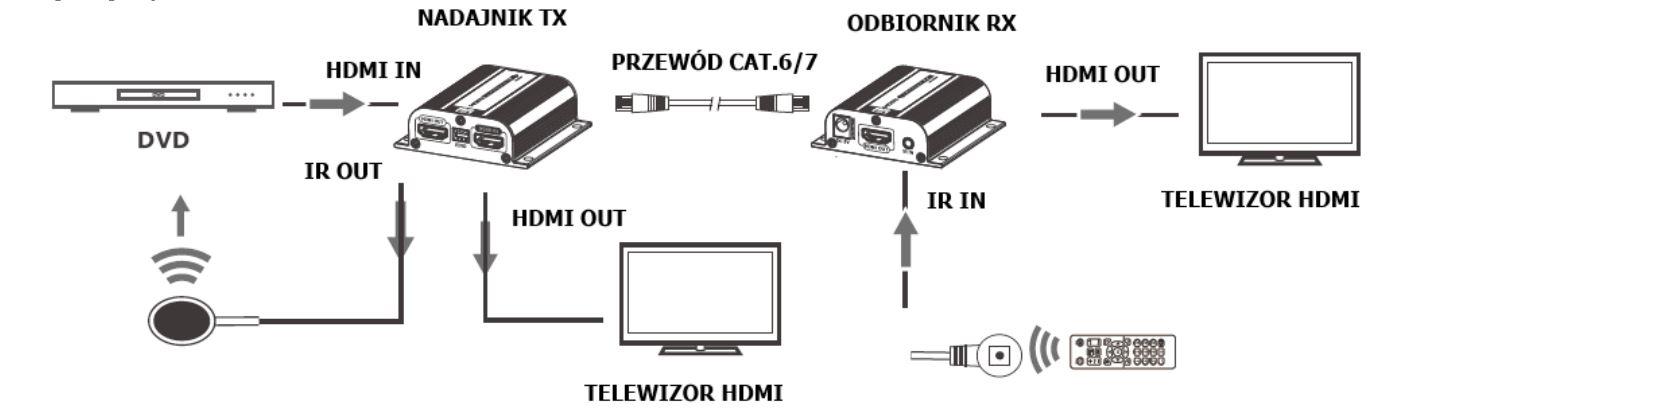 Extender HDMI LKV372EDID